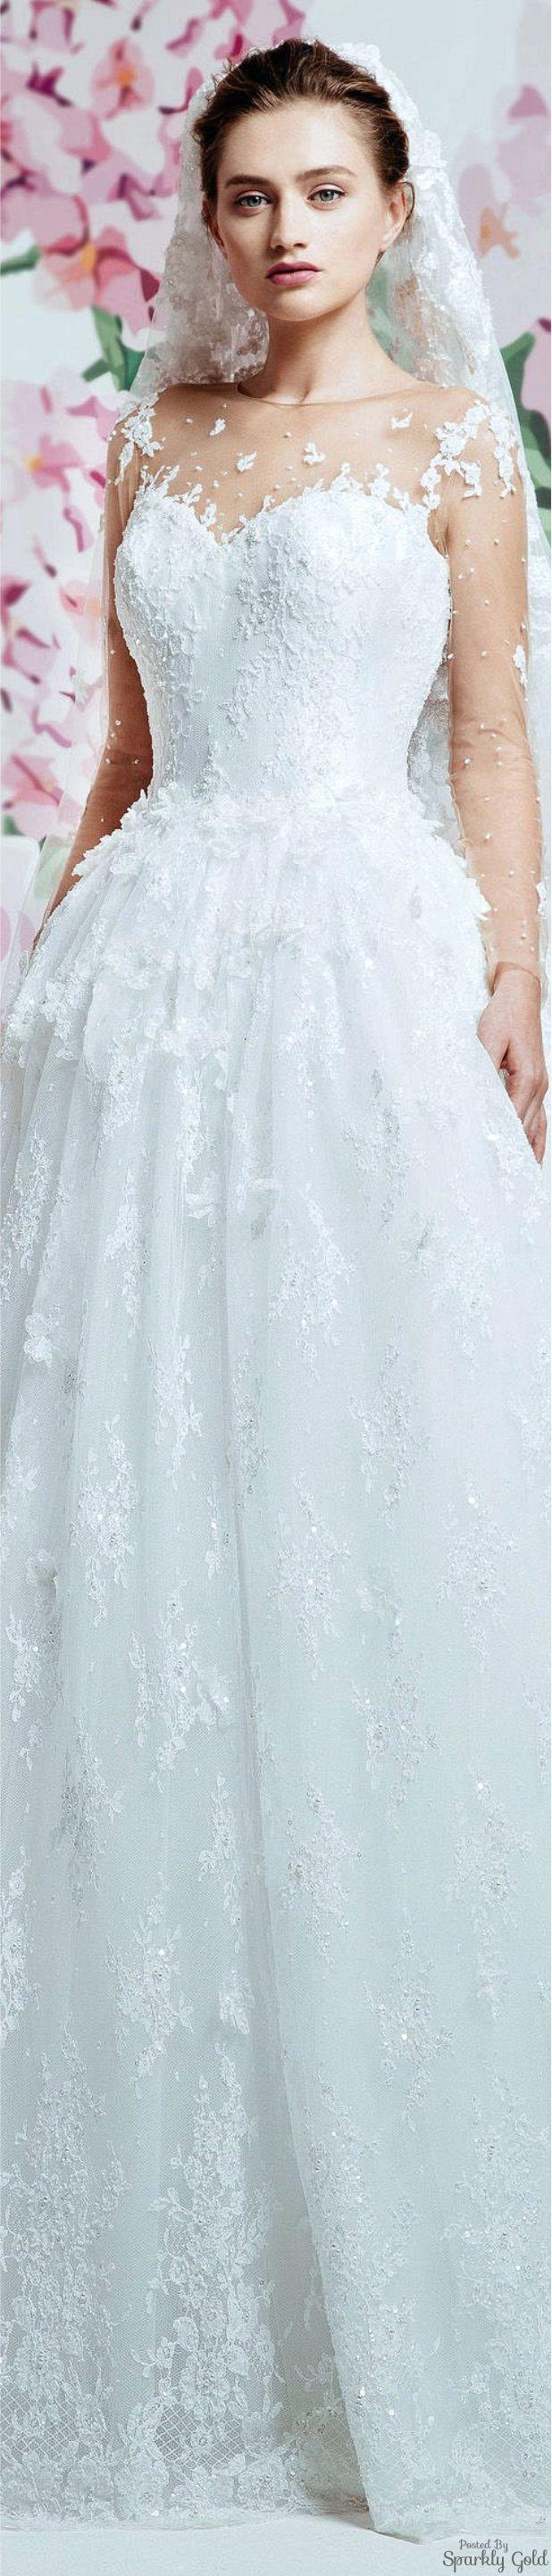 Georges Hobeika Spring 2017 Bridal | Alta costura y moda | Pinterest ...